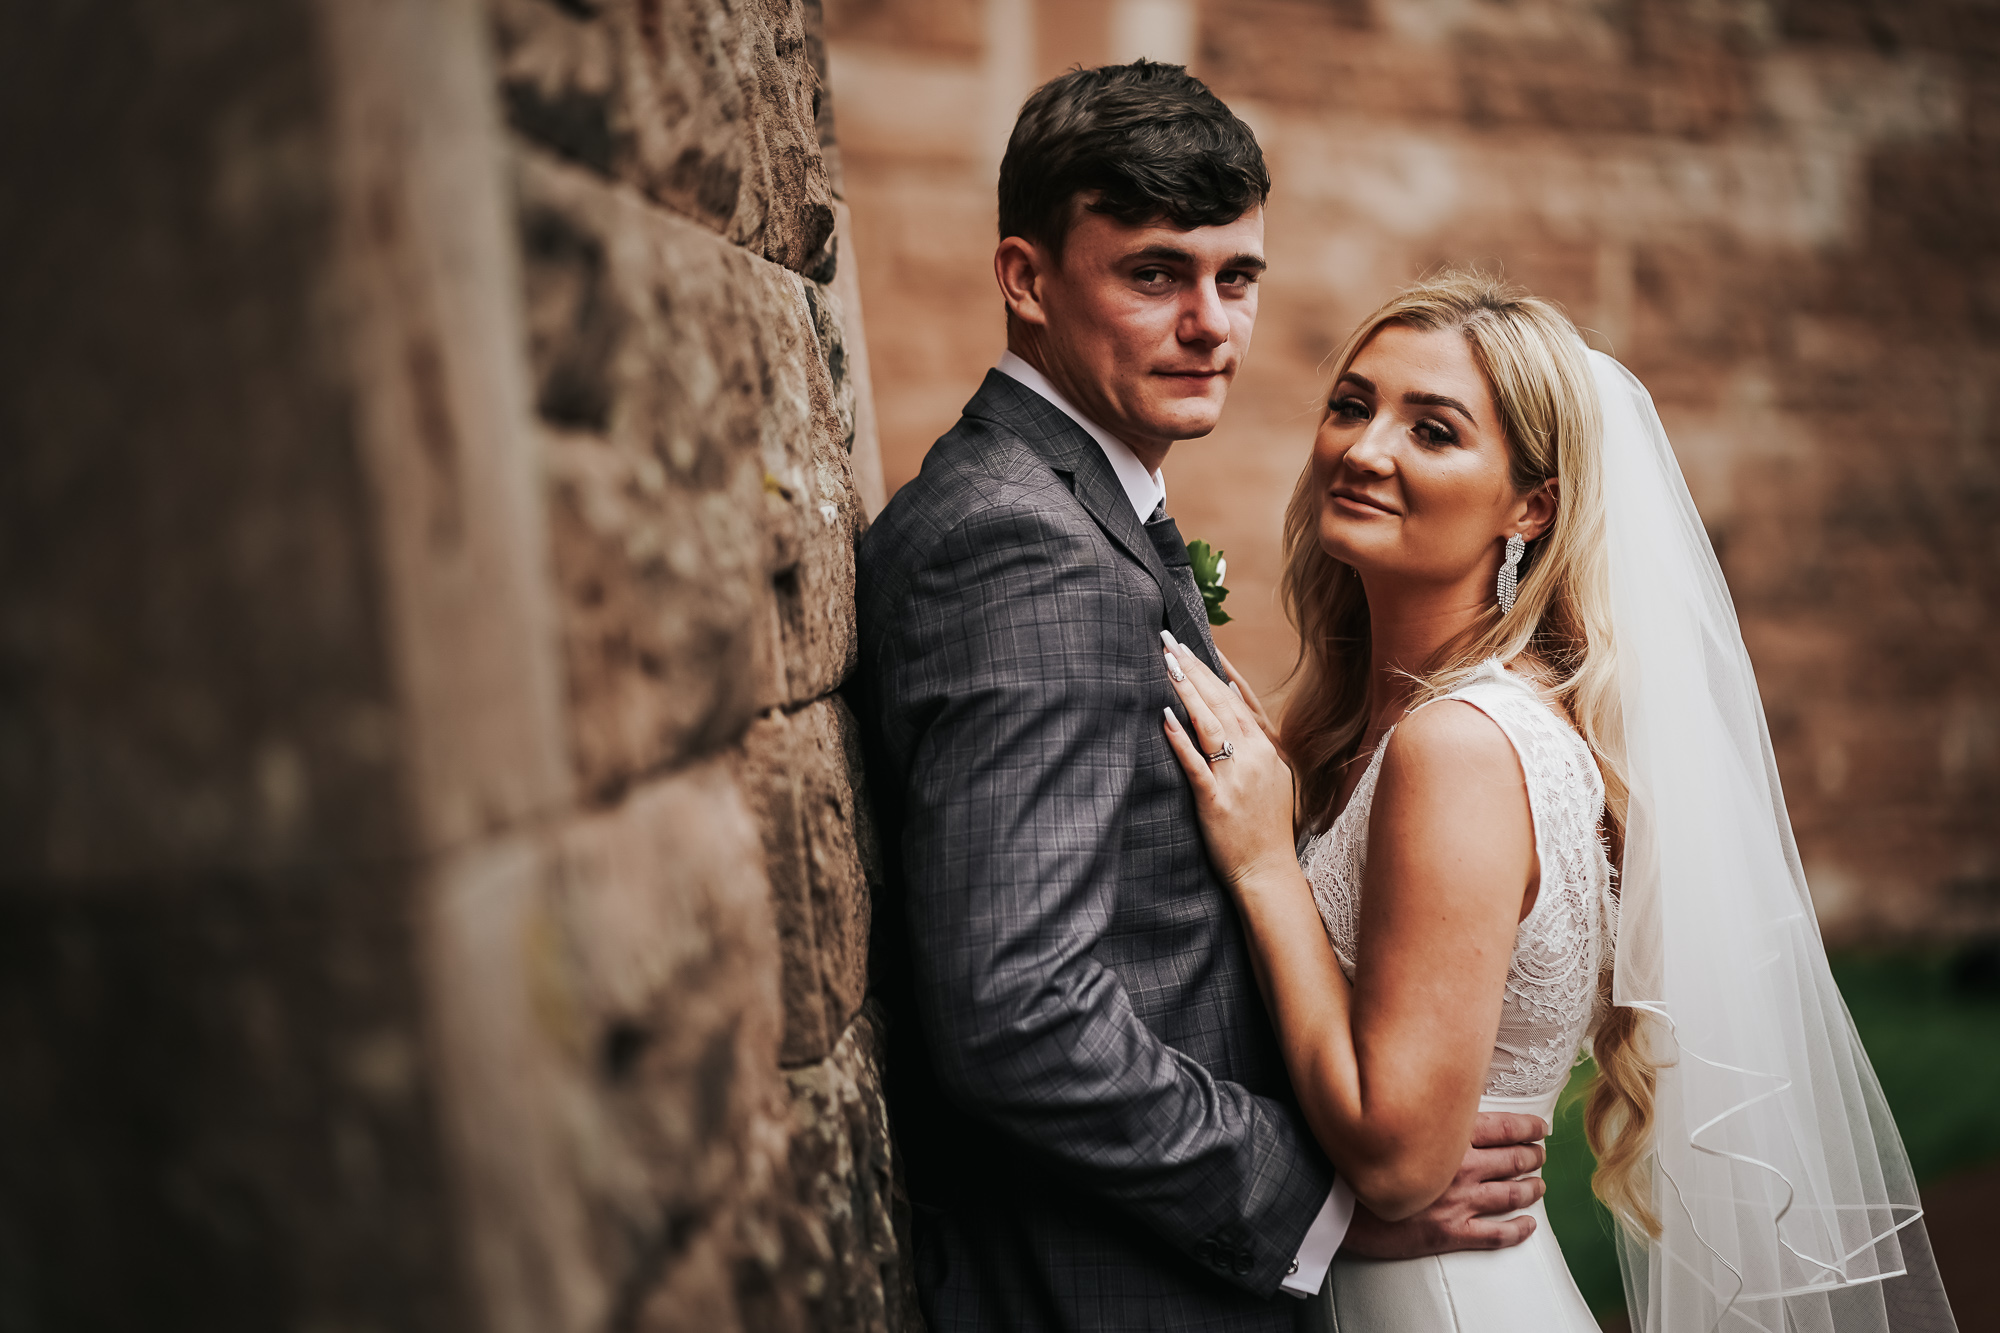 Peckforton Castle wedding photography cheshire wedding photographer (47 of 57).jpg